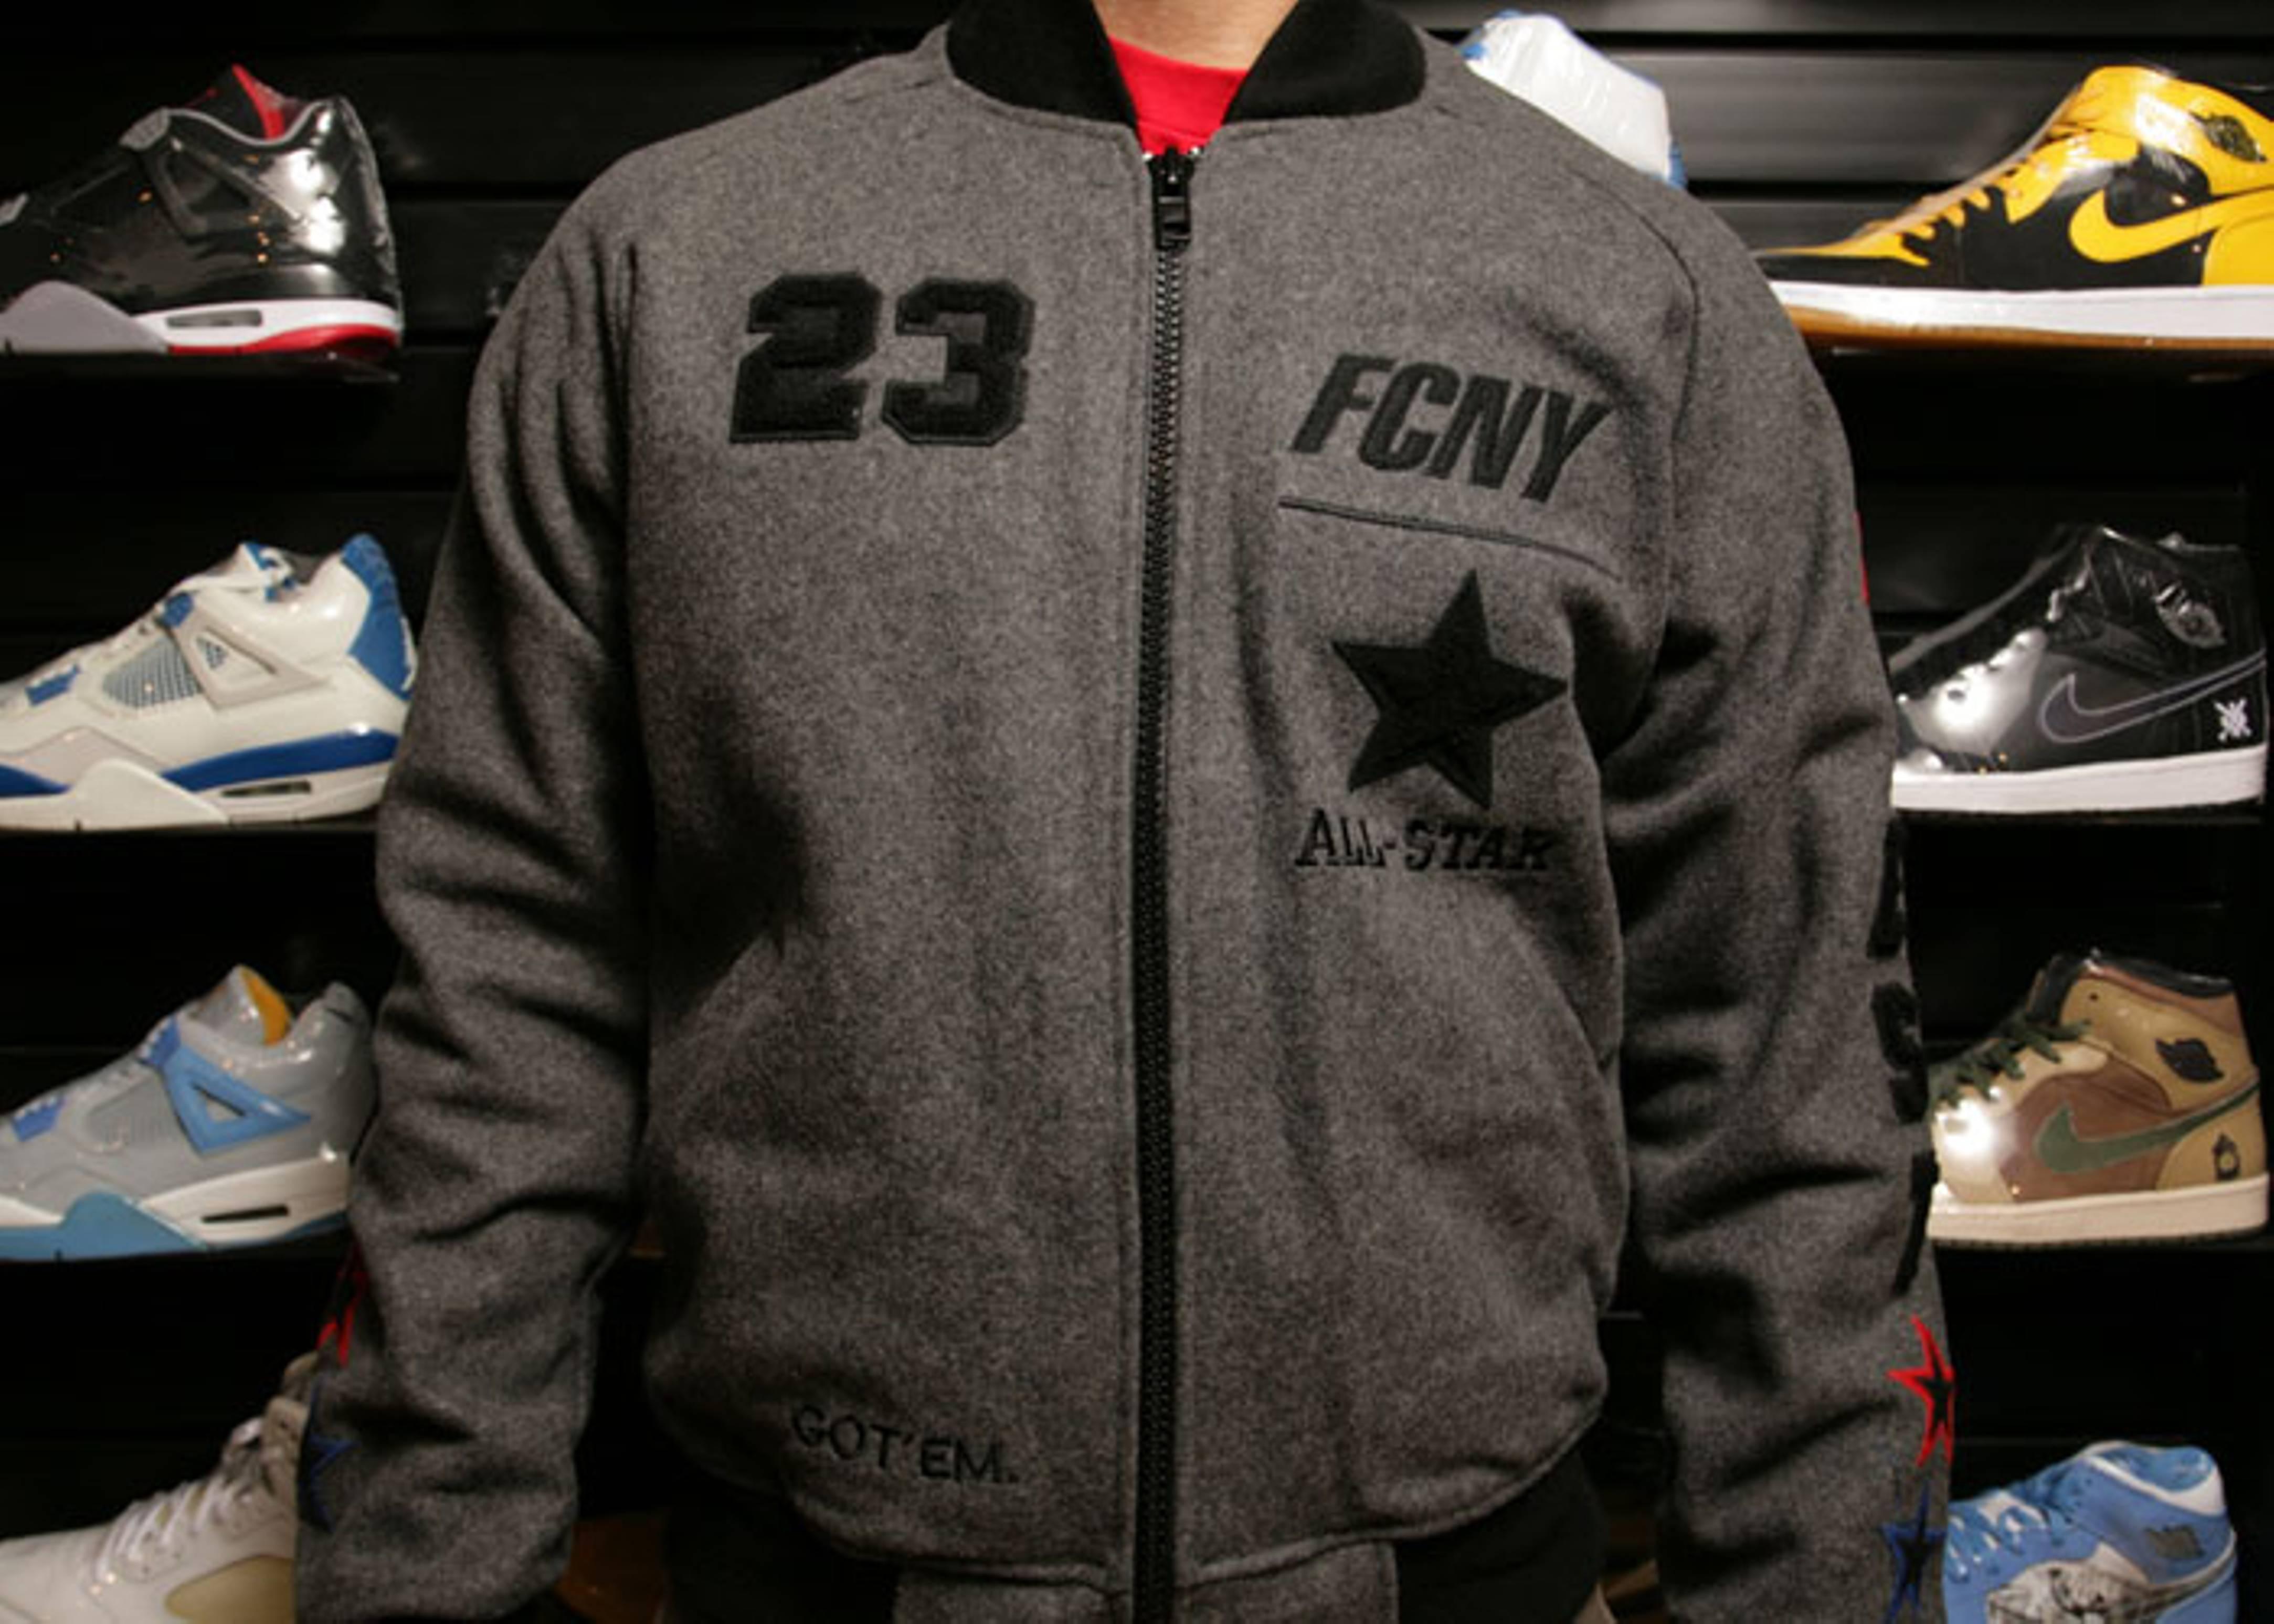 all-star varsity jacket